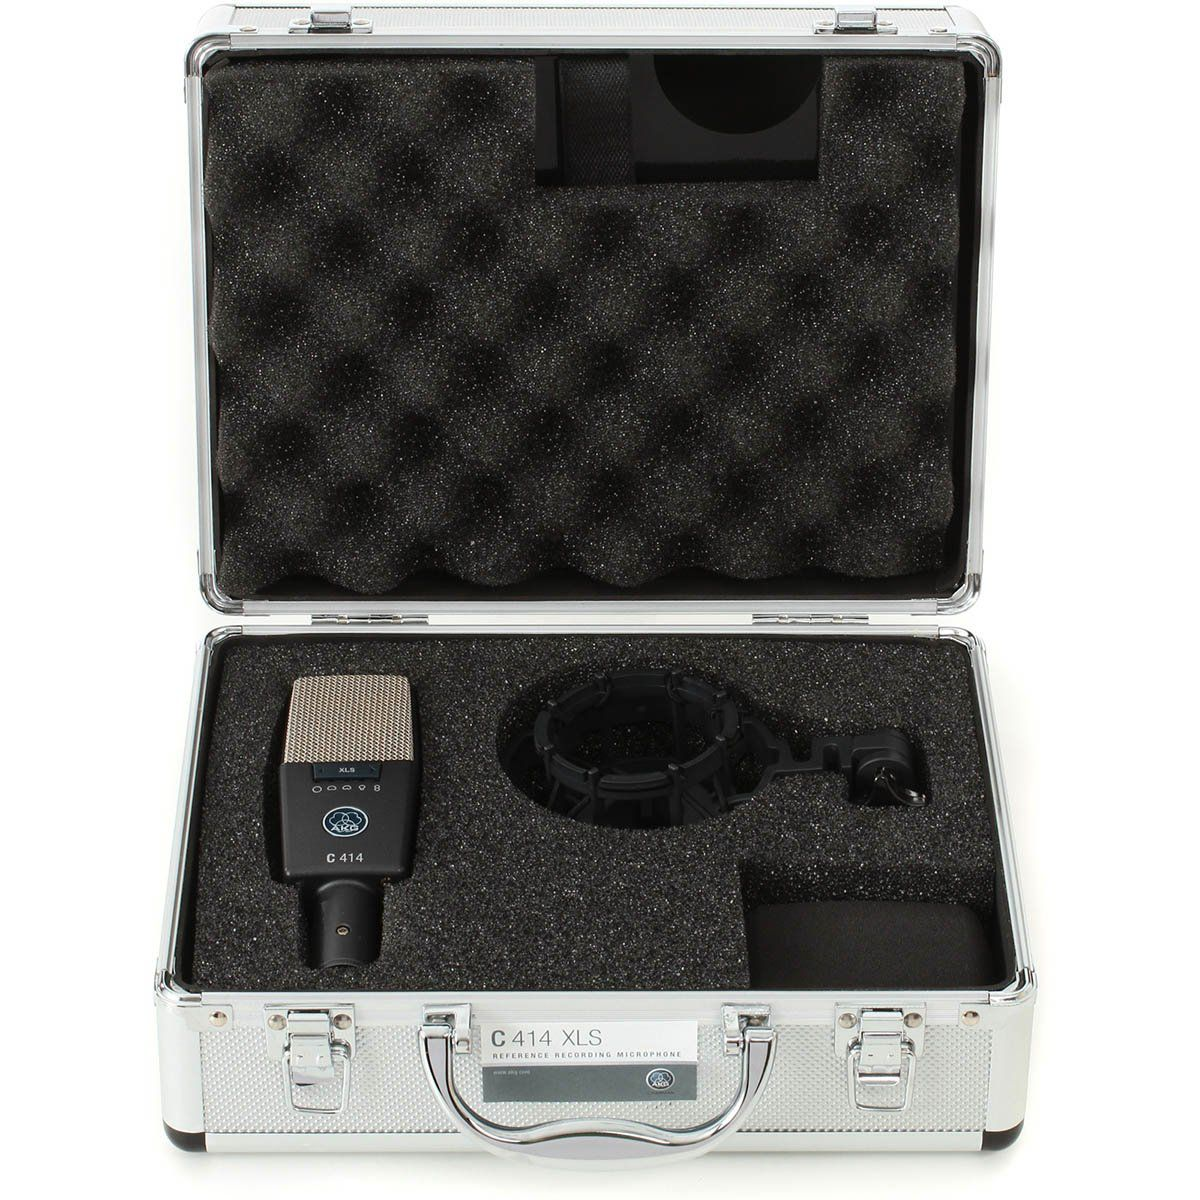 Akg C414 XLS Microfone Condensador Akg C414-XLS Diafragma Grande Versátil